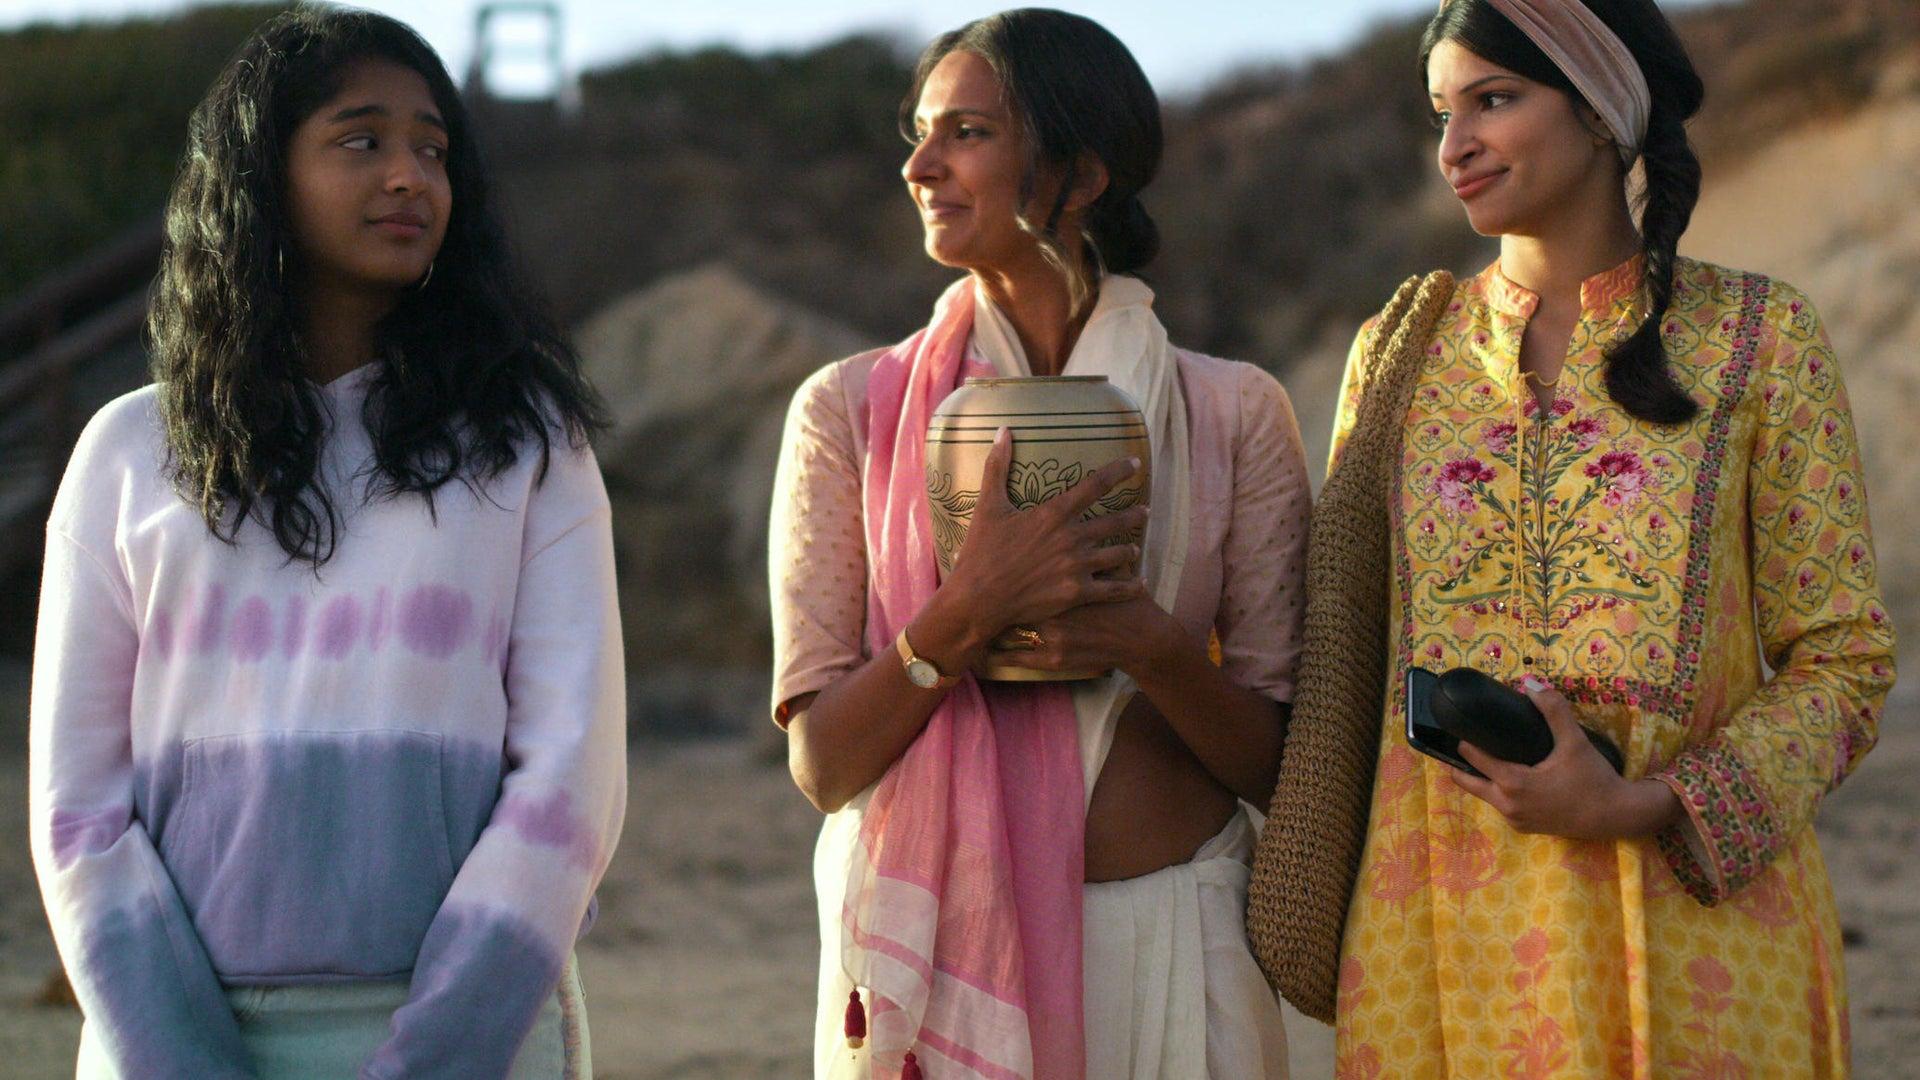 Maitreyi Ramakrishnan, Poorna Jagannathan, and Richa Moorjani, Never Have I Ever